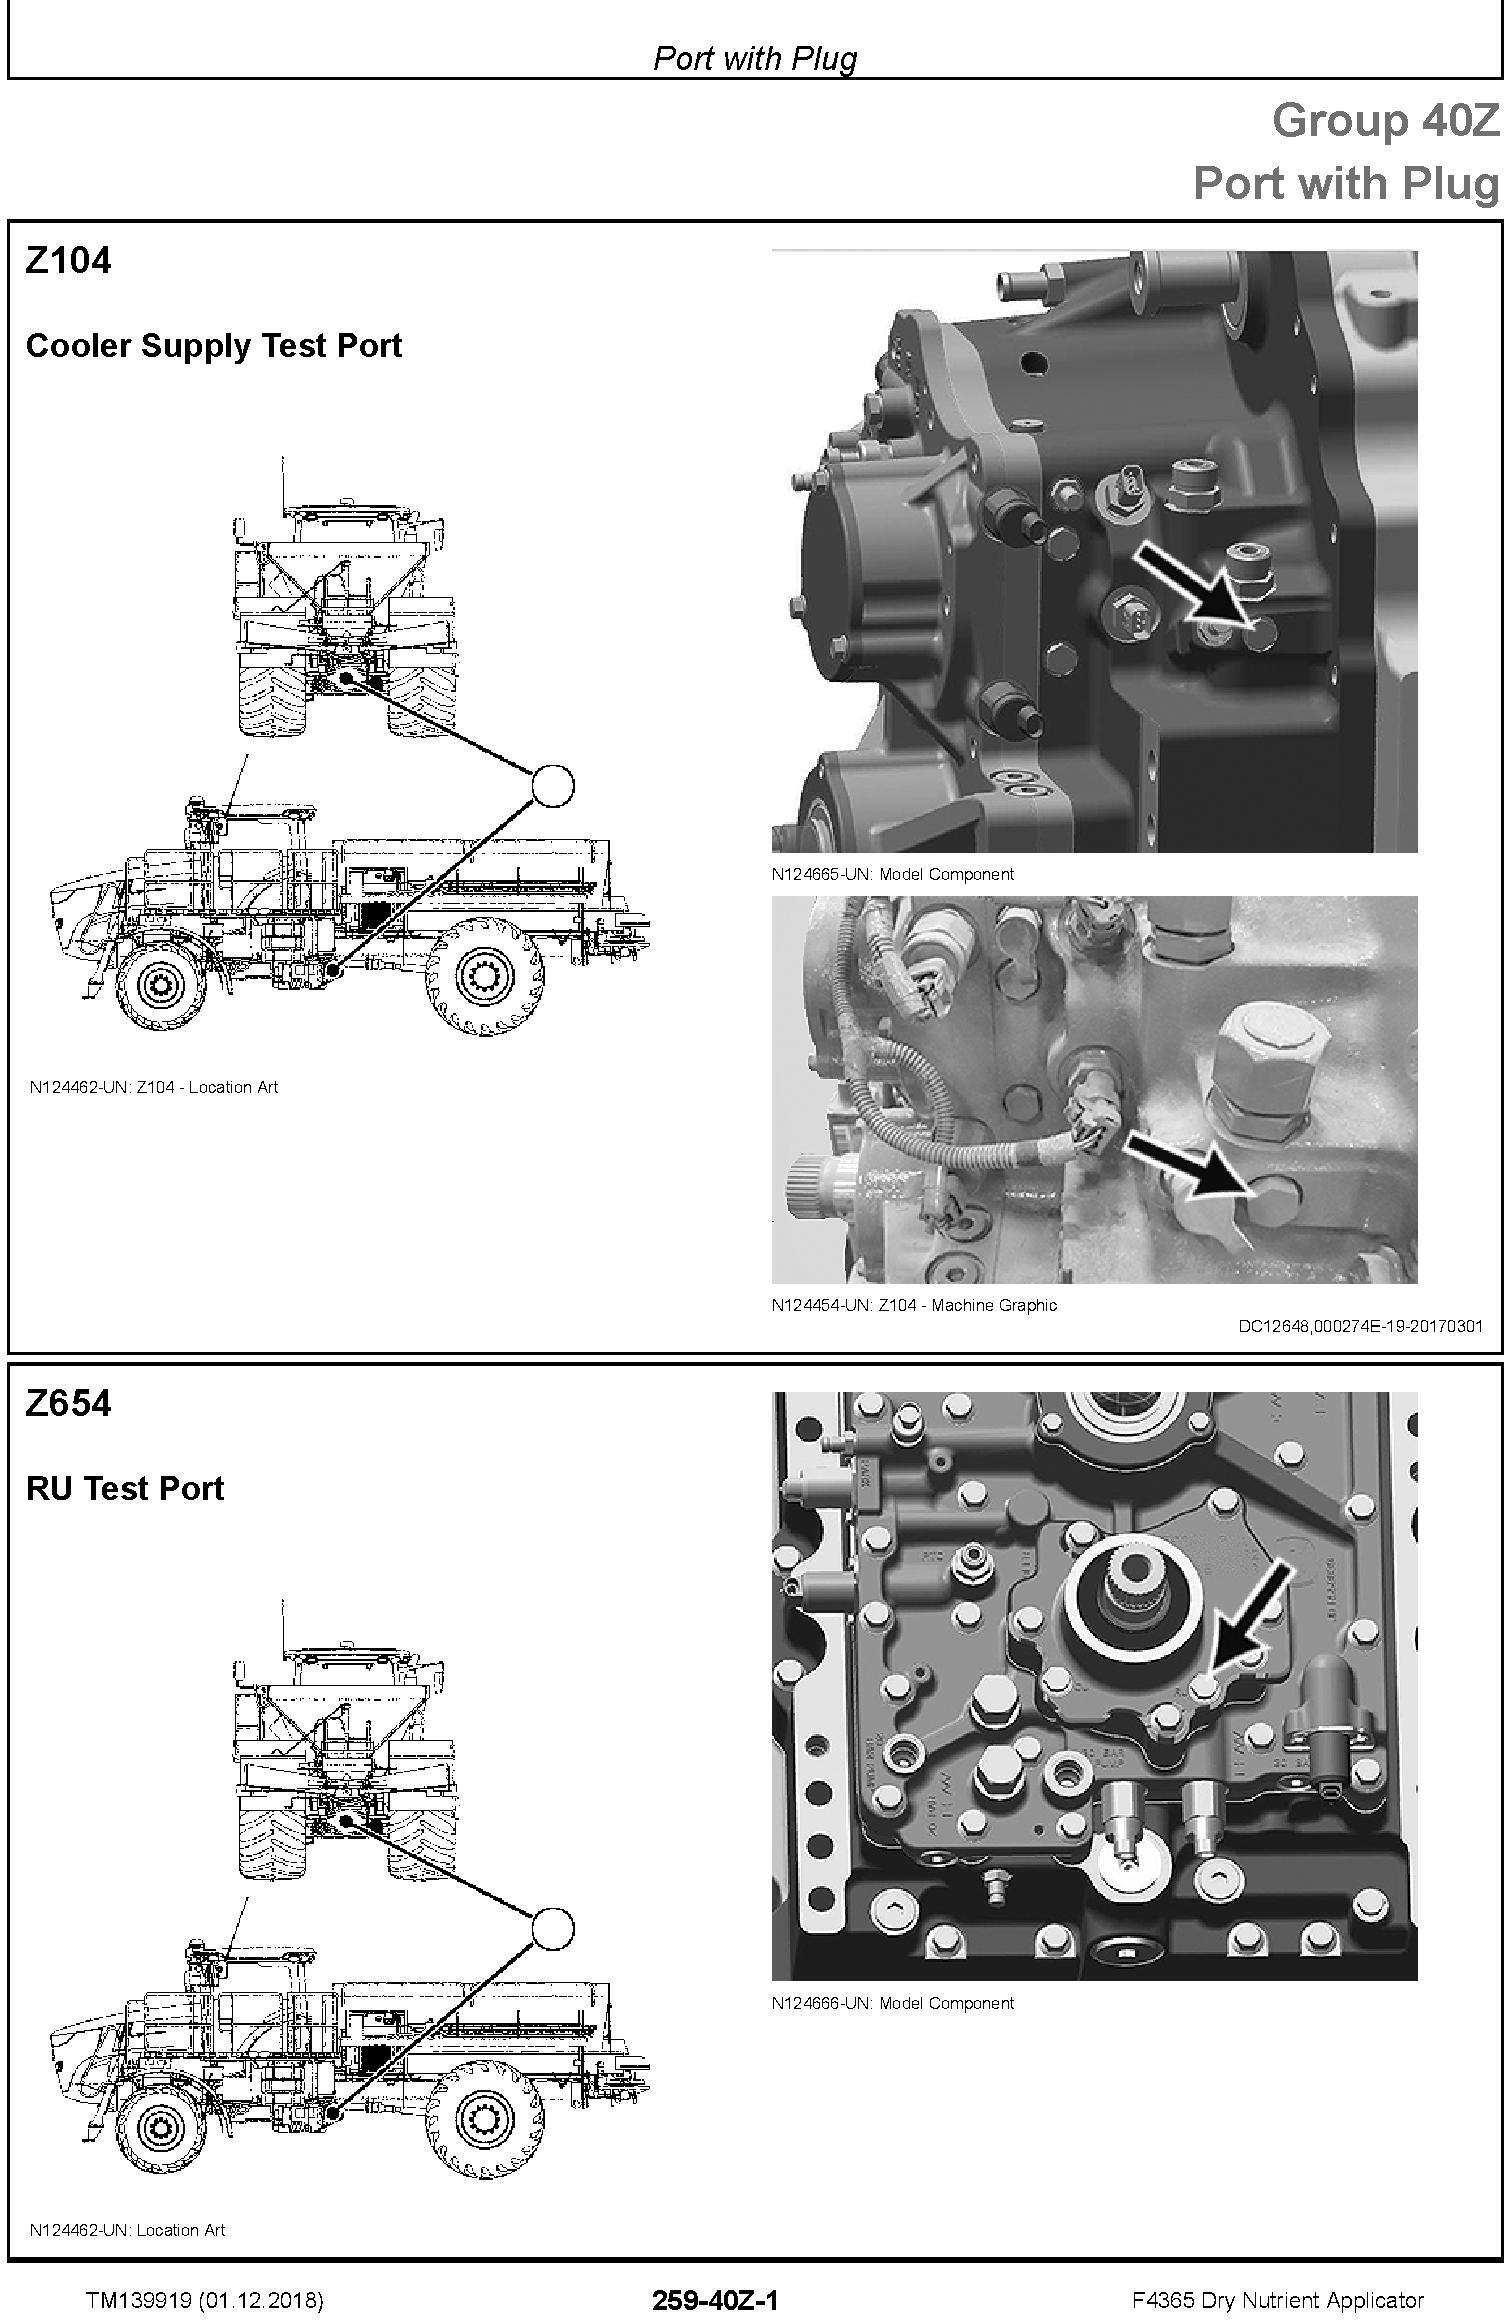 John Deere F4365 Dry Nutrient Applicator Diagnostic Technical Service Manual (TM139919) - 2